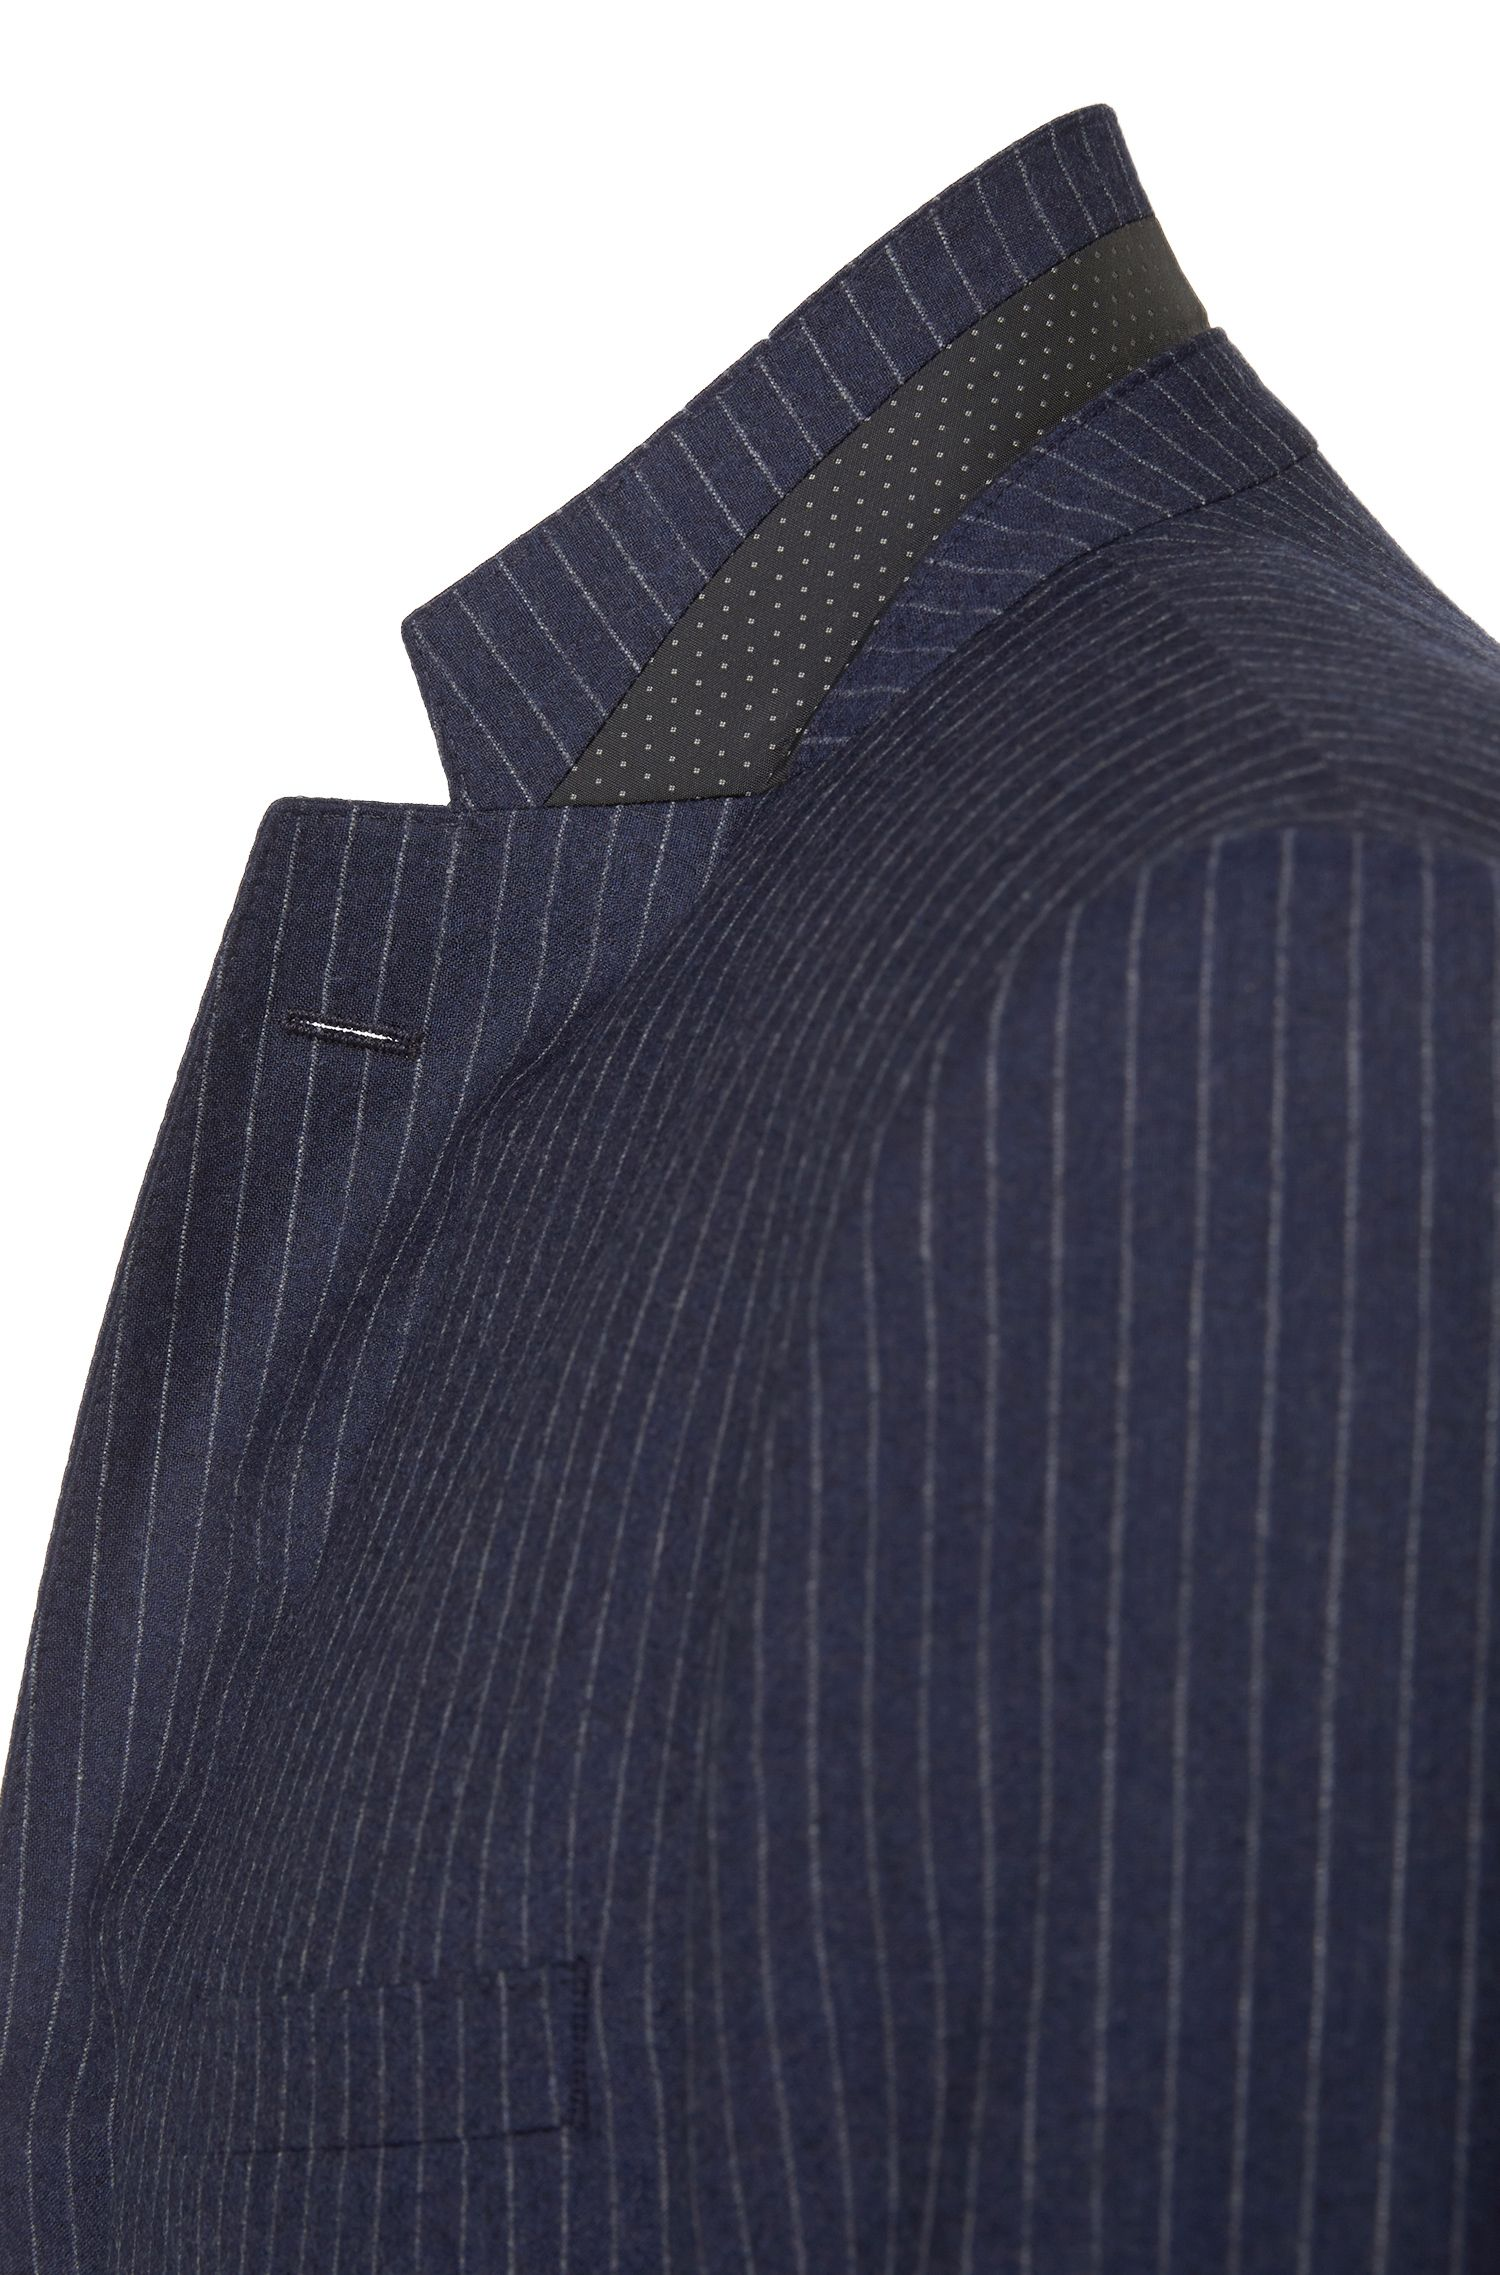 Costume Regular Fit en laine vierge à rayures fines: «C-Jeys1/C-Shaft1»